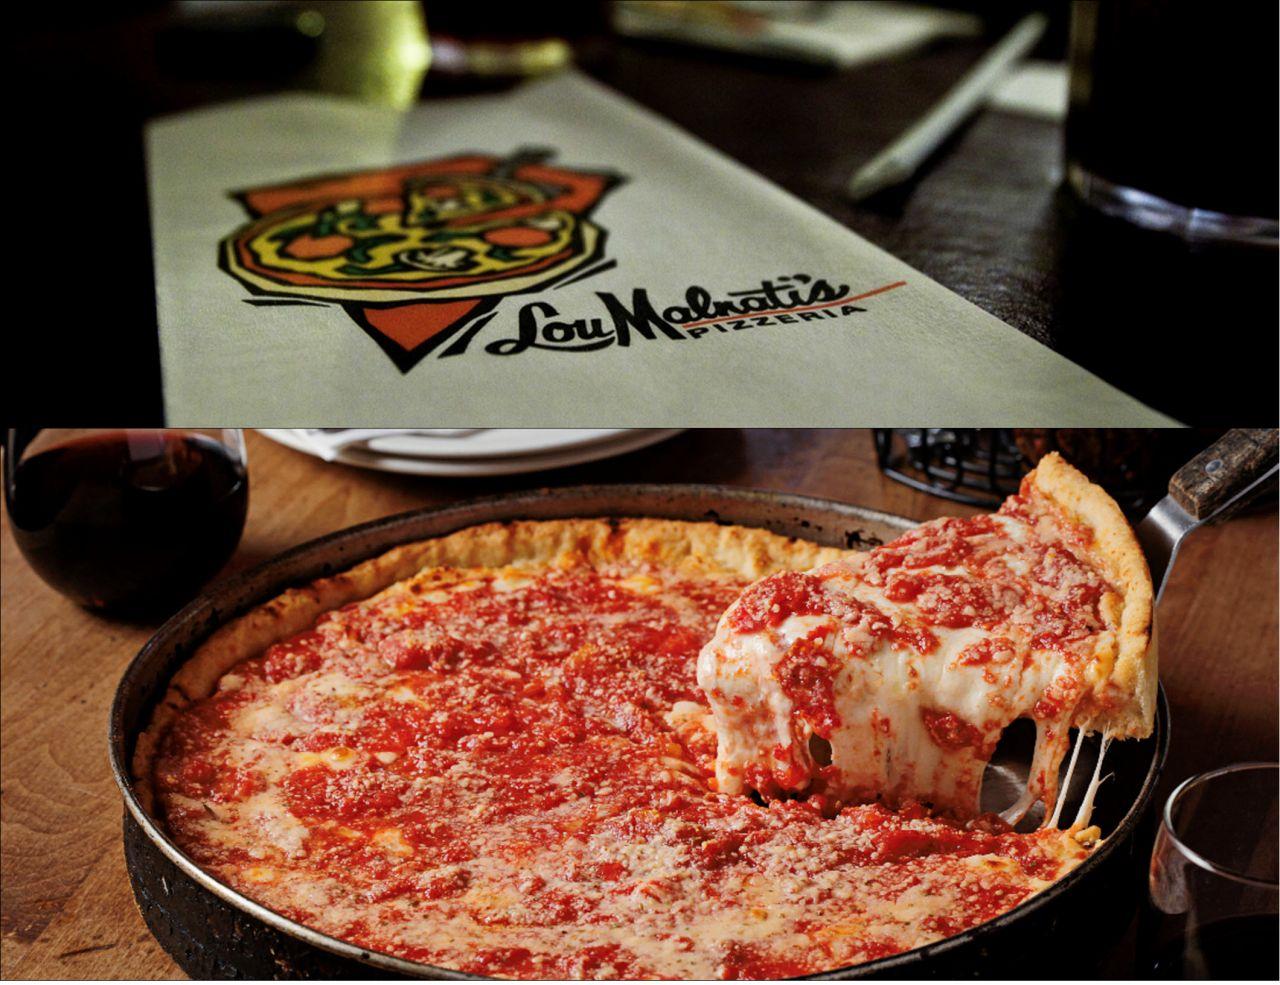 Chicago style pizza Lou malnatis Чикагская пицца Дип диш